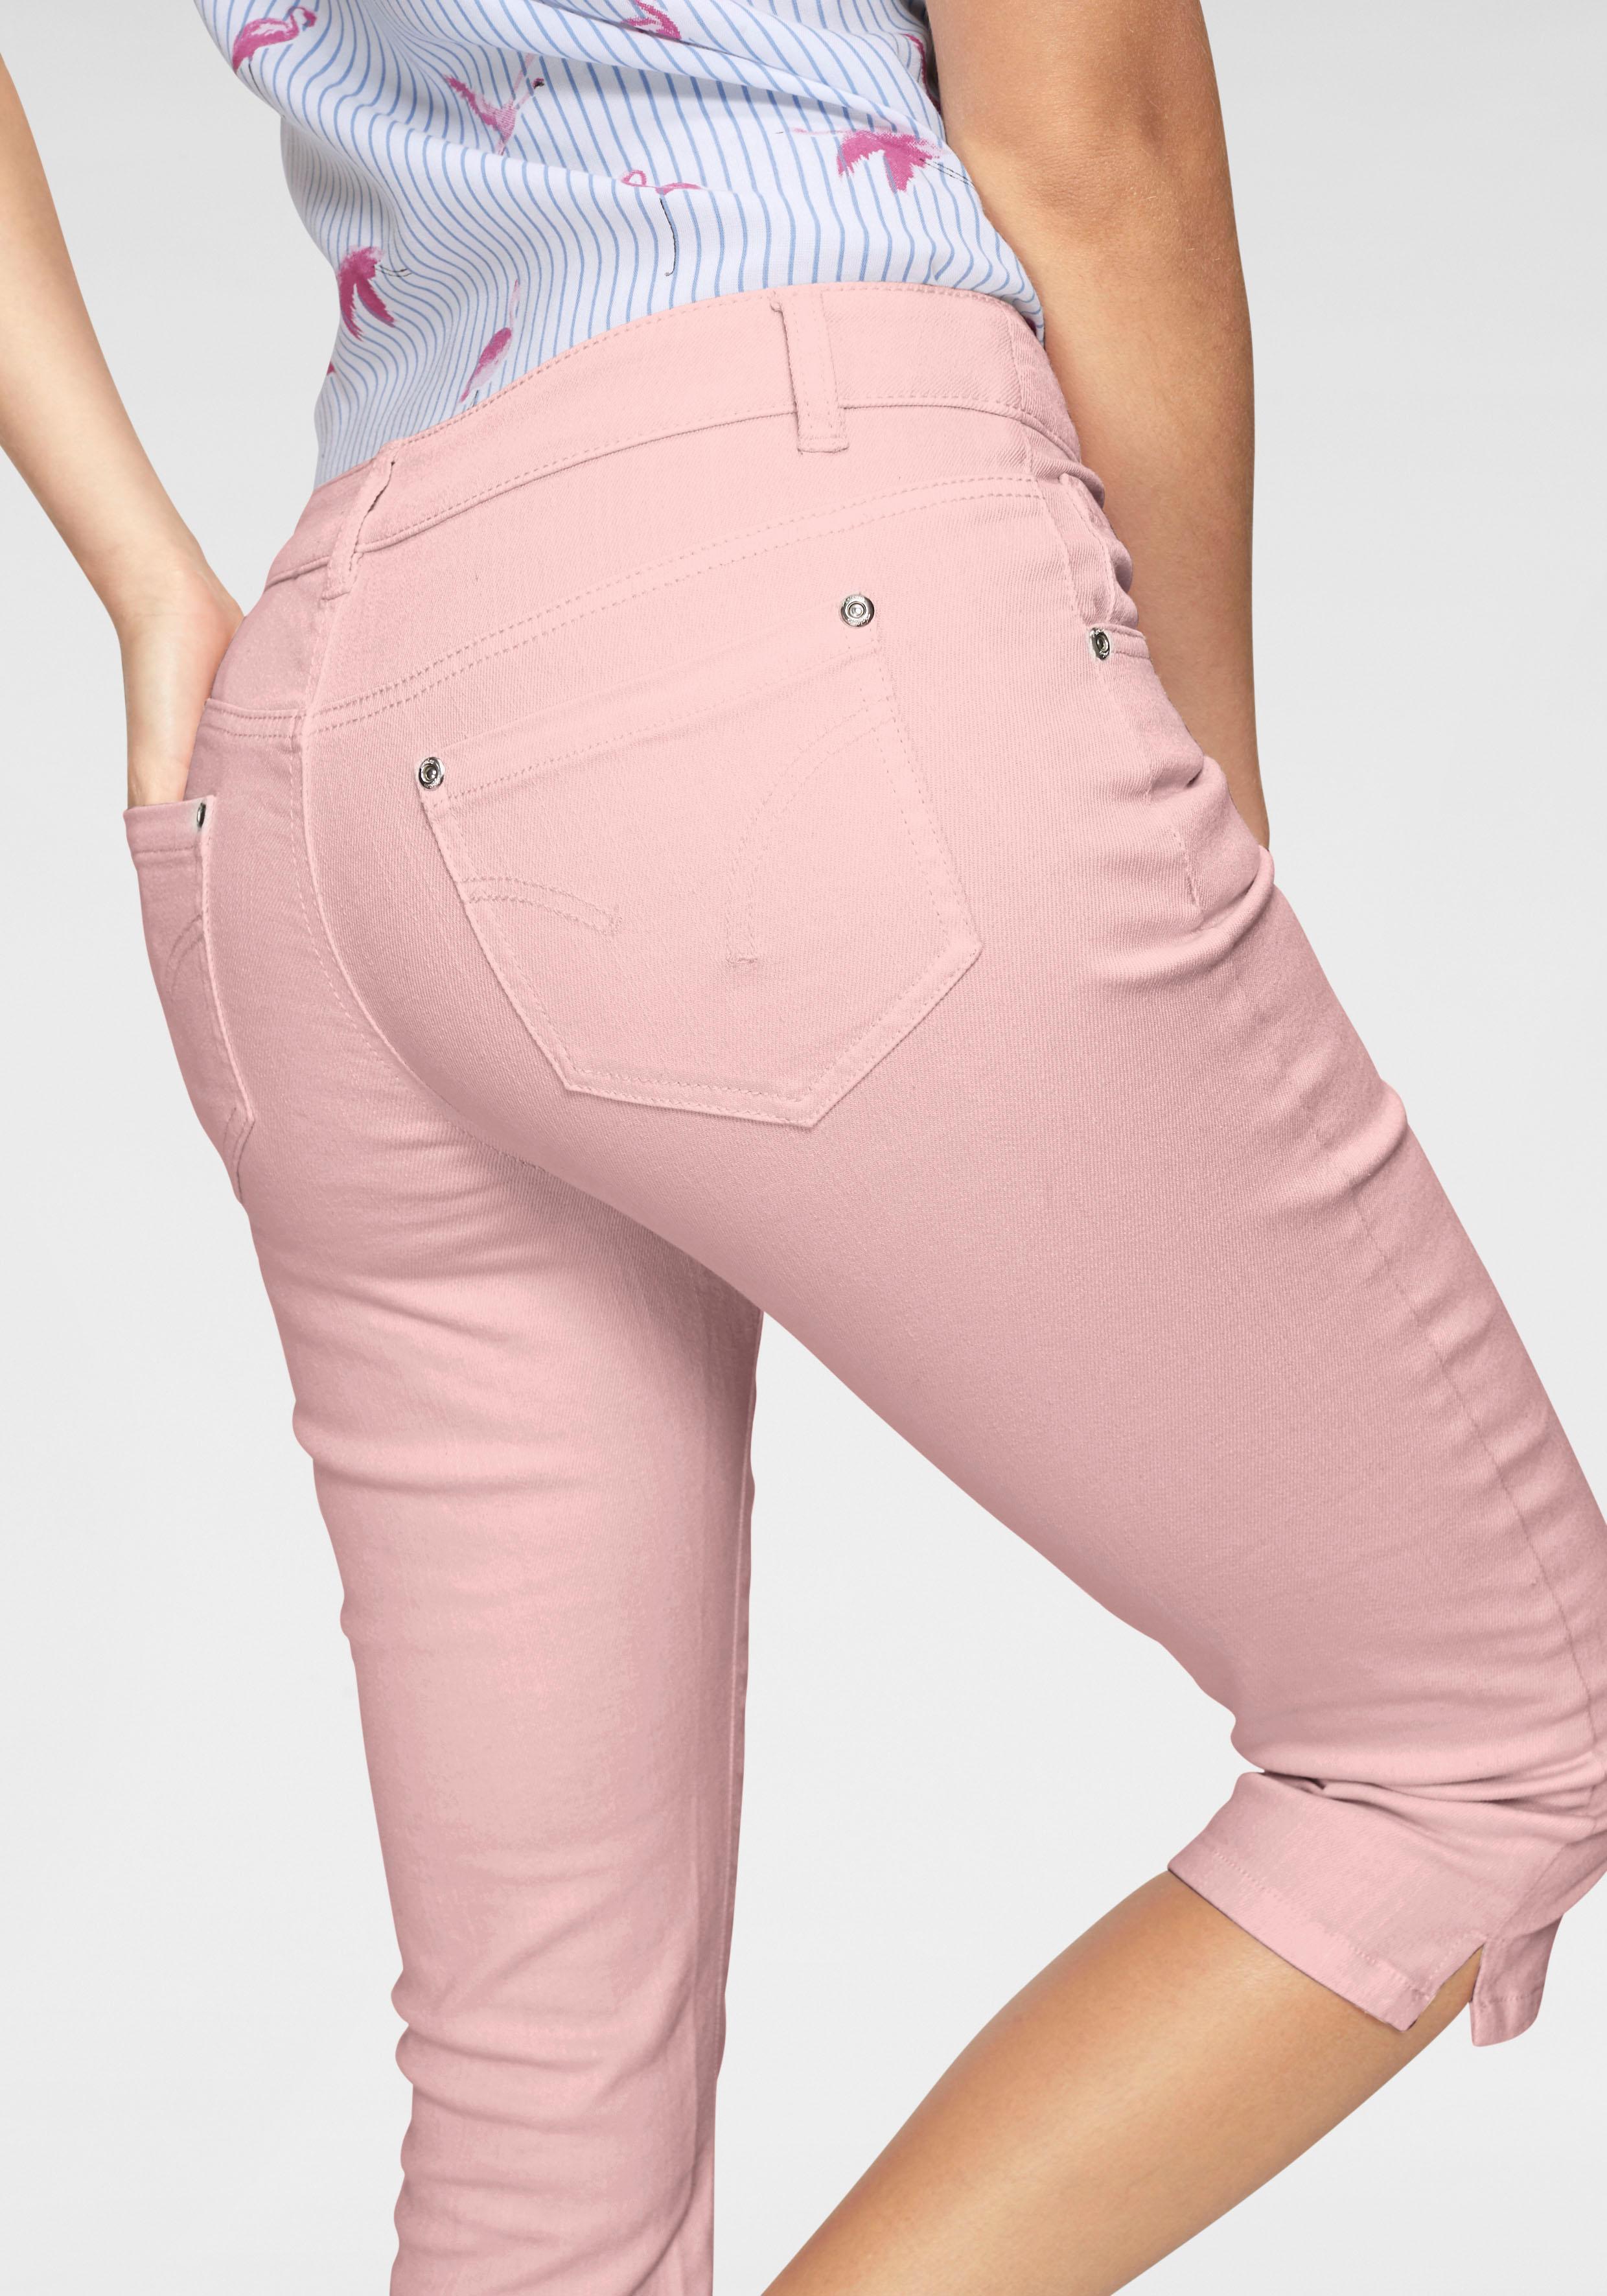 Aniston CASUAL Caprijeans | Bekleidung > Jeans > Caprijeans | Aniston Casual